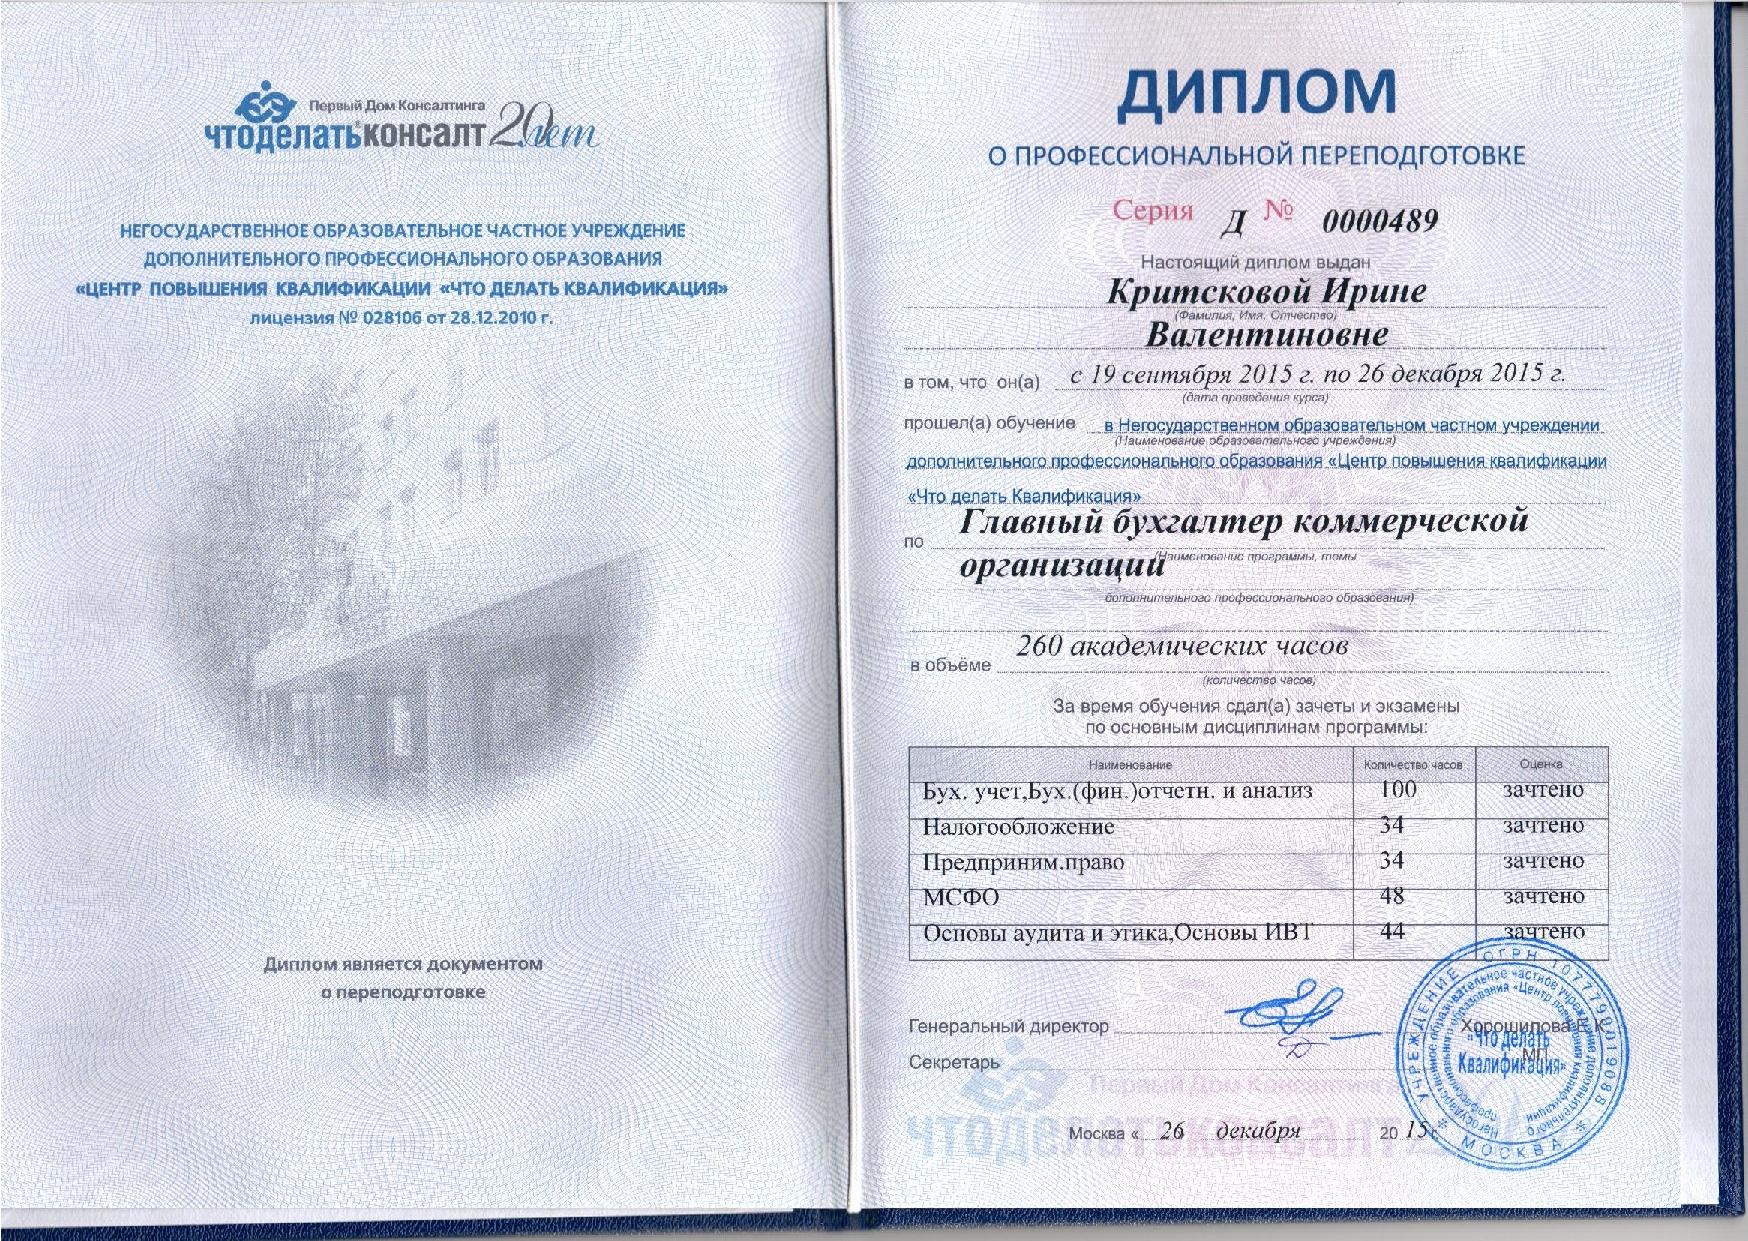 http://www.konsaltingpremium.ru/wp-content/uploads/2016/09/diplom.jpg